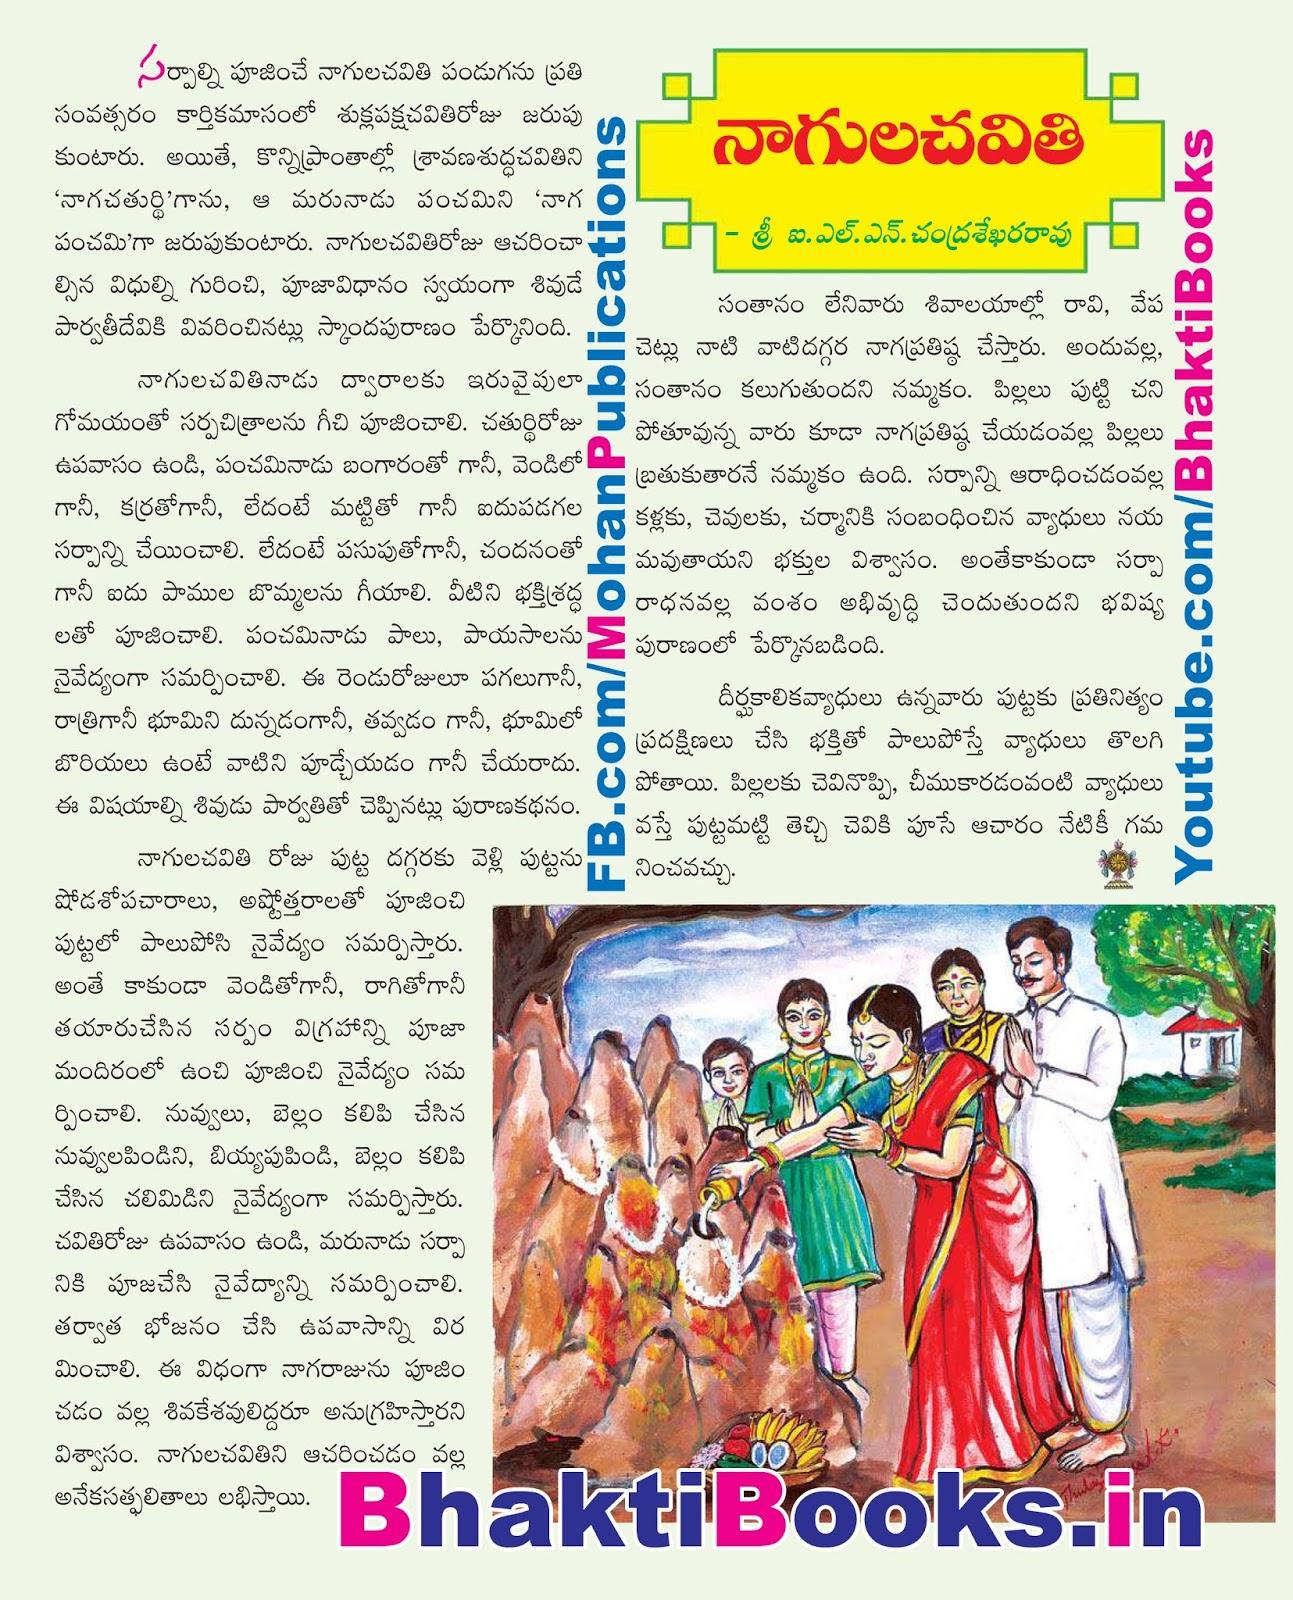 ttd, ttd ebooks, Tirumala Tirupathi, Tirumala Tirupathi Devastanams, Tirupathi Prasadam, Sapthagiri, Saptagiri, BhaktiBooks, BhaktiPustakalu, BhaktiBooks.in, Mohan Publications, Bhakthi Books Store in Rajahmundry, Book Store in Rajahmundry, Chaganti, Chaganti Pravachanalu, Nagulachavithi, Nagulachaviti, Nagula Chavithi, Nagula Chaviti